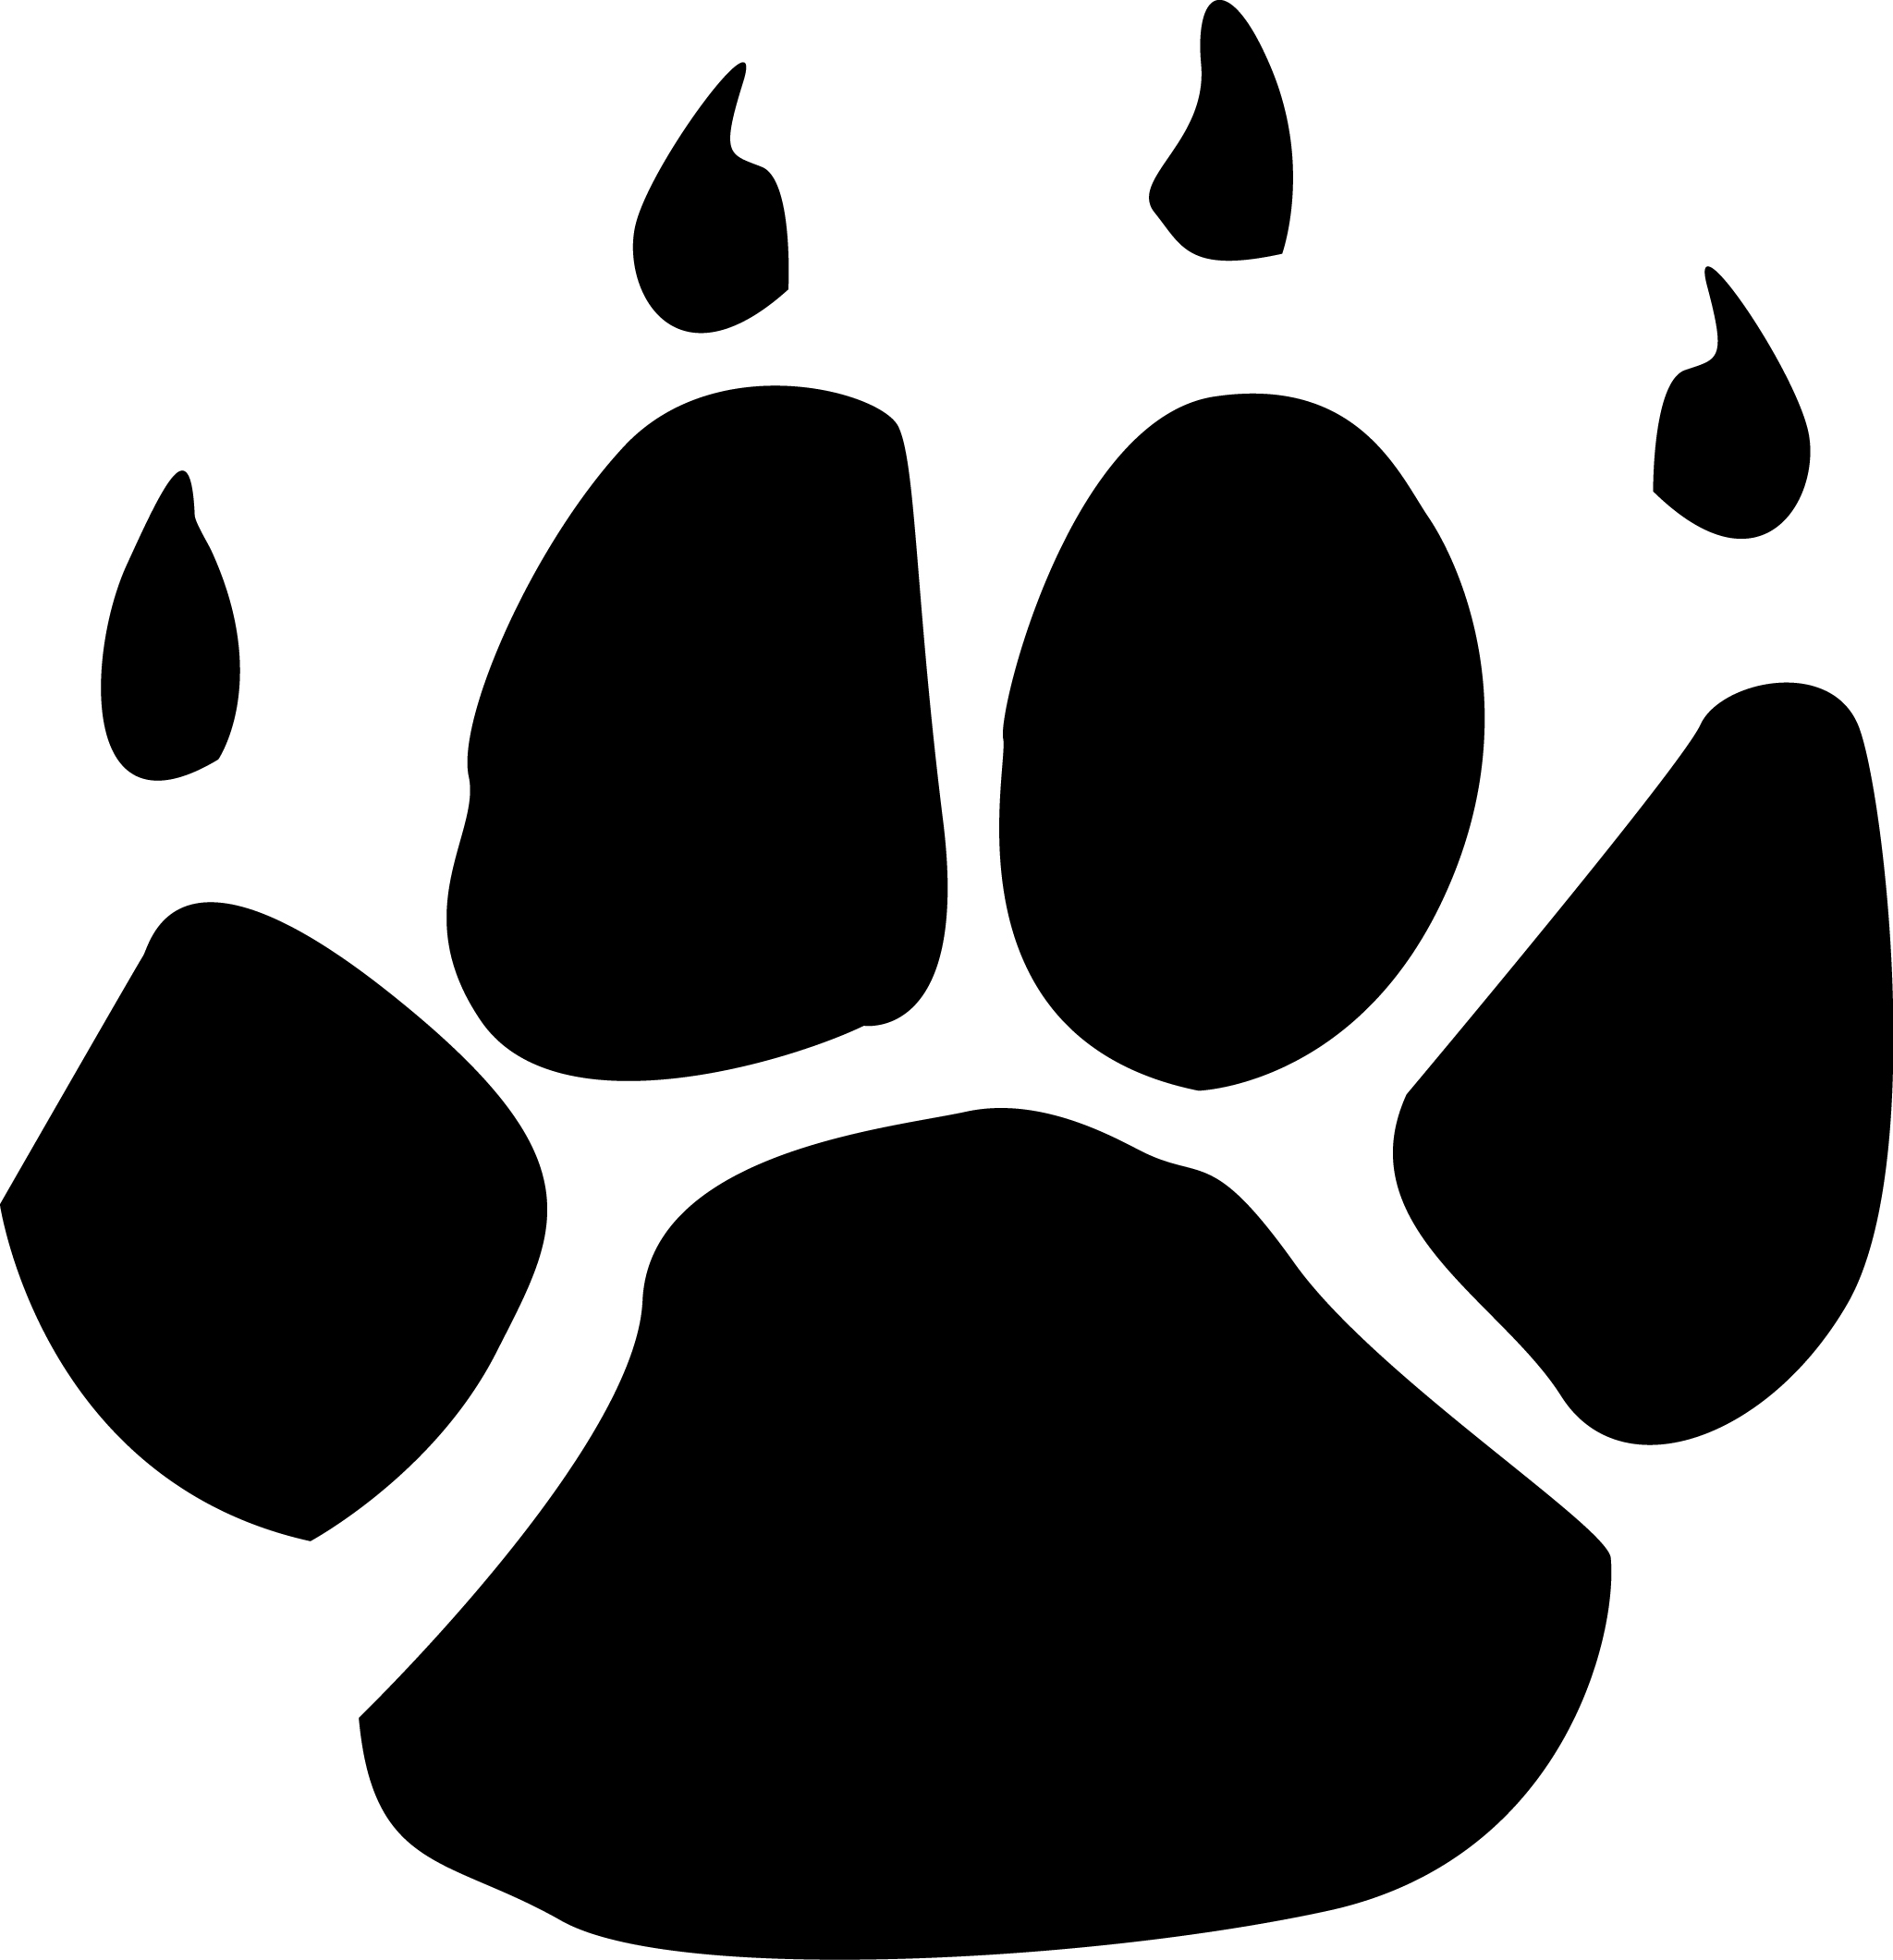 Wildcat clipart cat's paw Paw Paw Prints Cliparts Wildcat